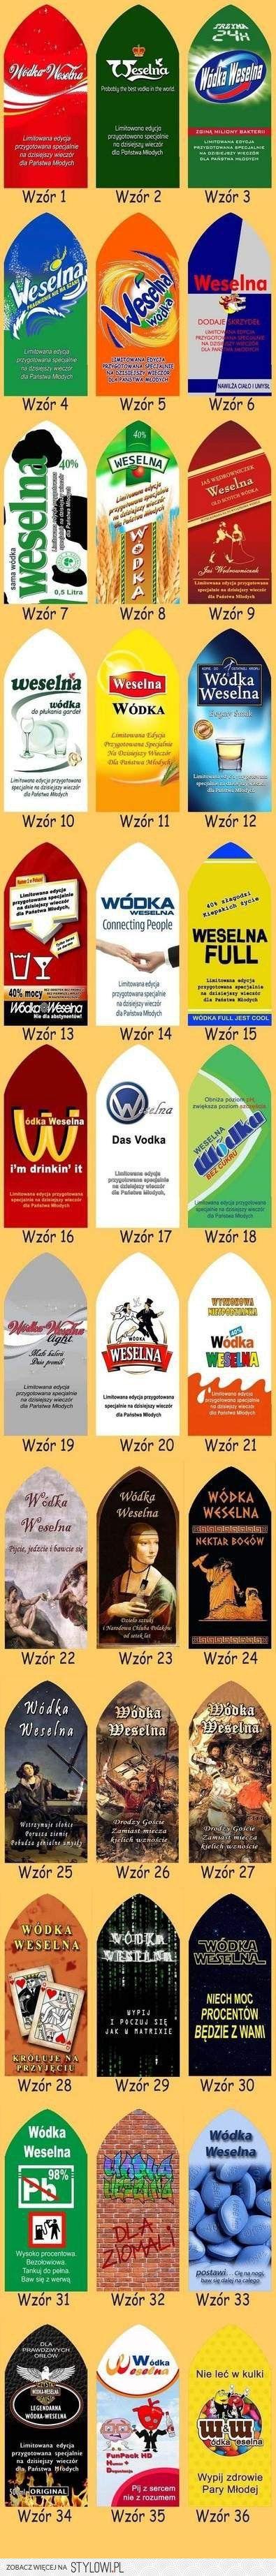 Wódka - KWEJK.pl na Stylowi.pl